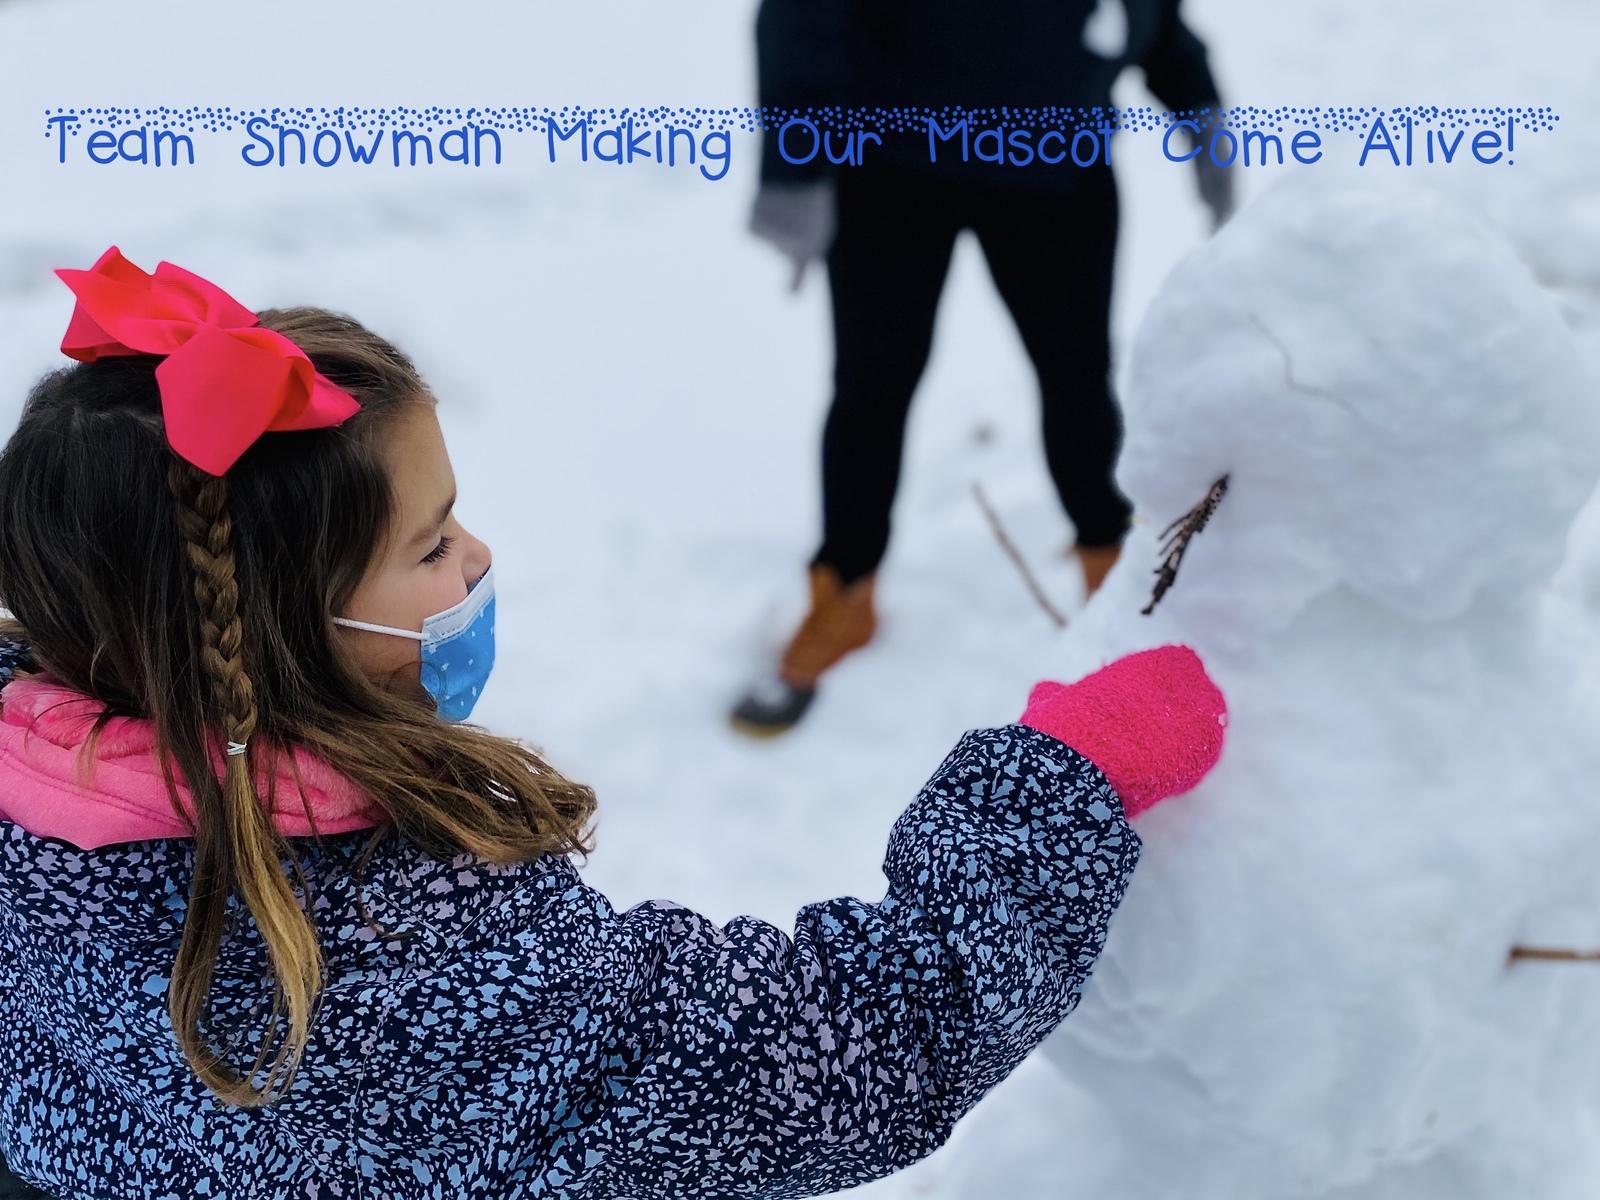 Week 1 Kindergarten Leroy H Smith Winter Games 2021 Moment of the Week